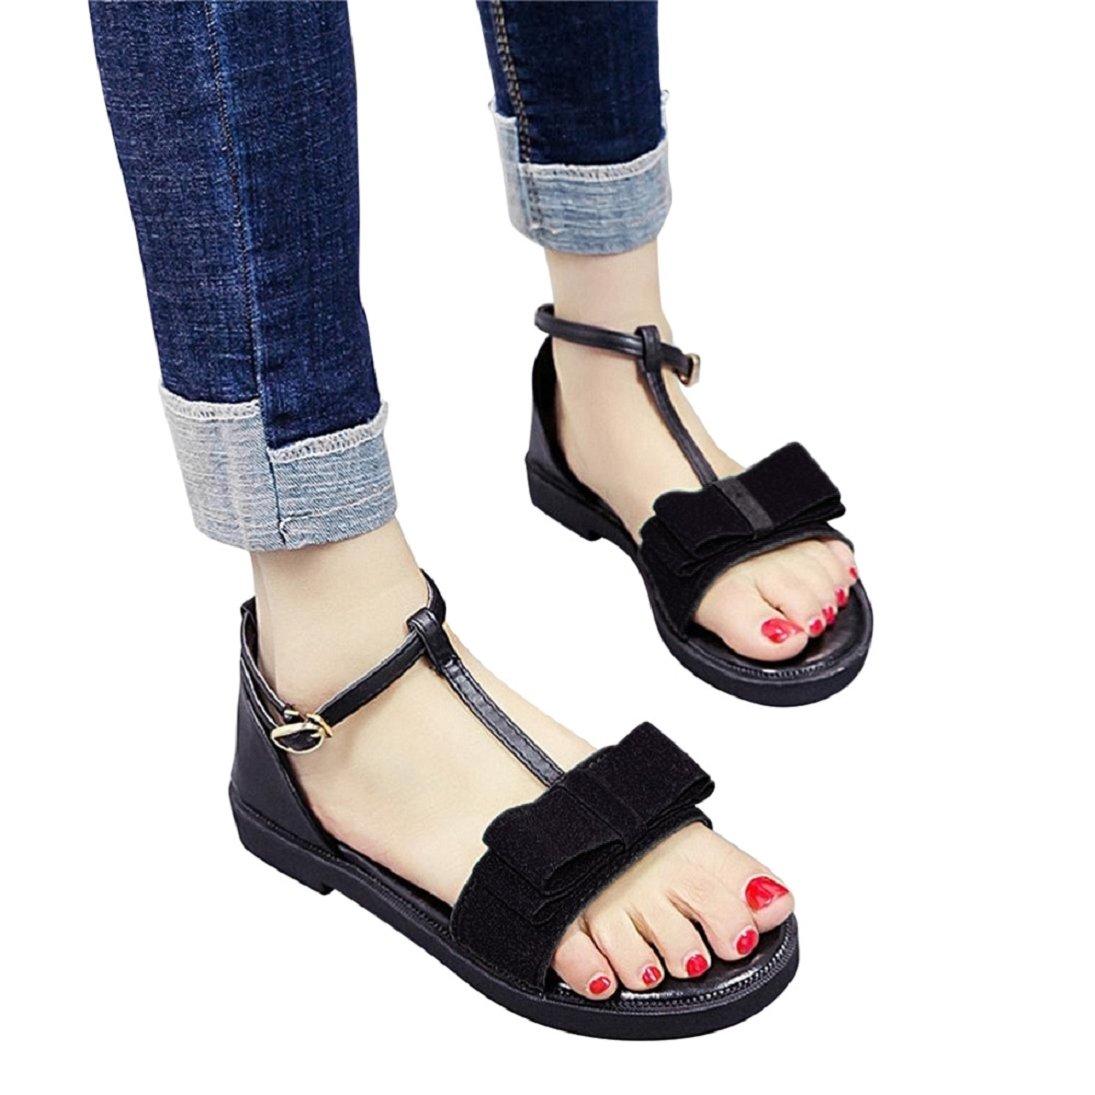 Fheaven Women Non-slip Sandals Summer Flat Bow Tie Black Sandals Buckle Strap Sandals (China size:37(US:6.5), Black)